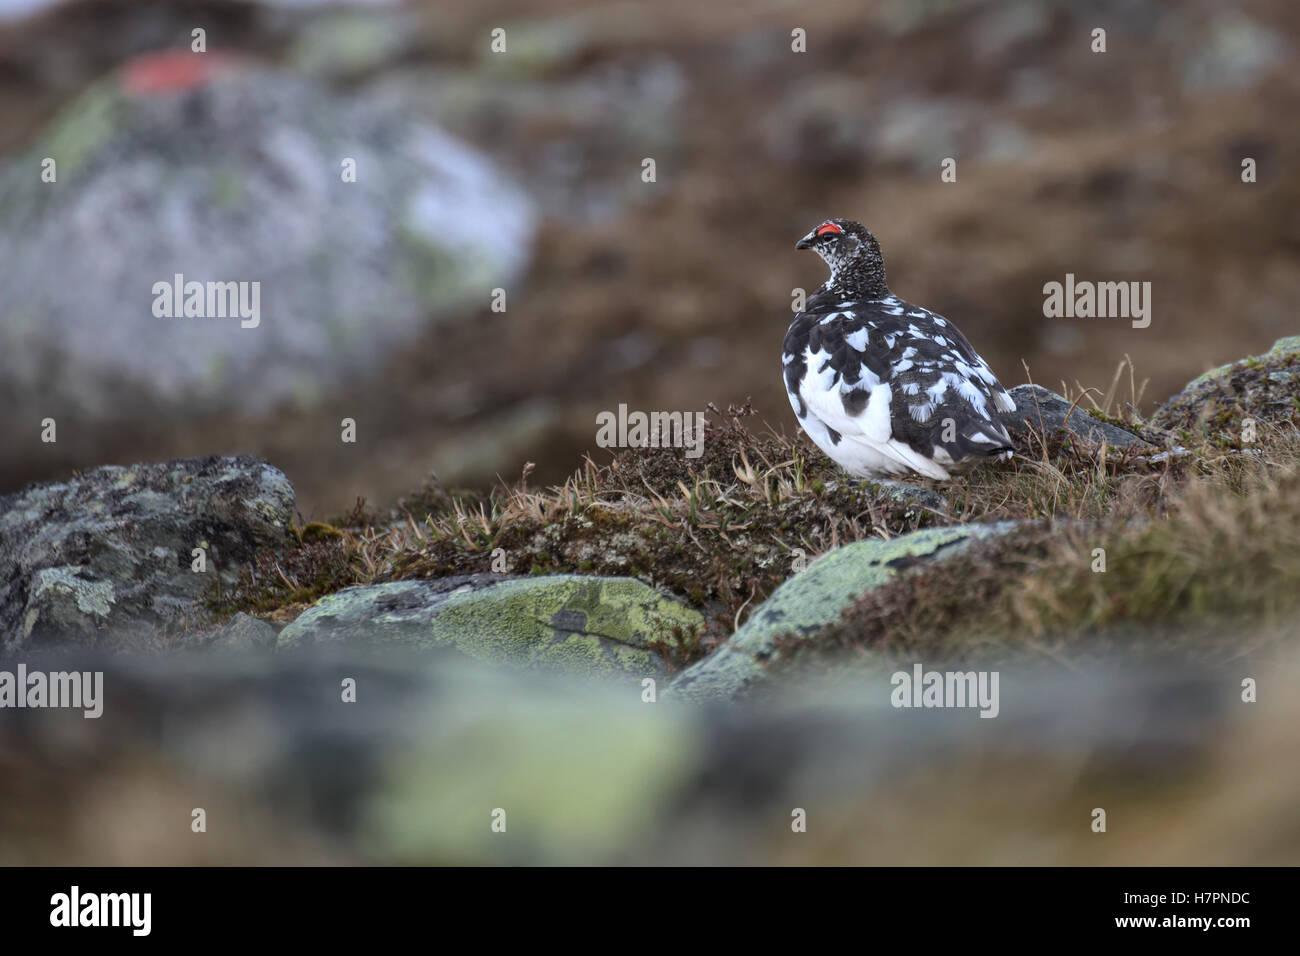 Male rock ptarmigan (Lagopus muta) in spring plumage. - Stock Image